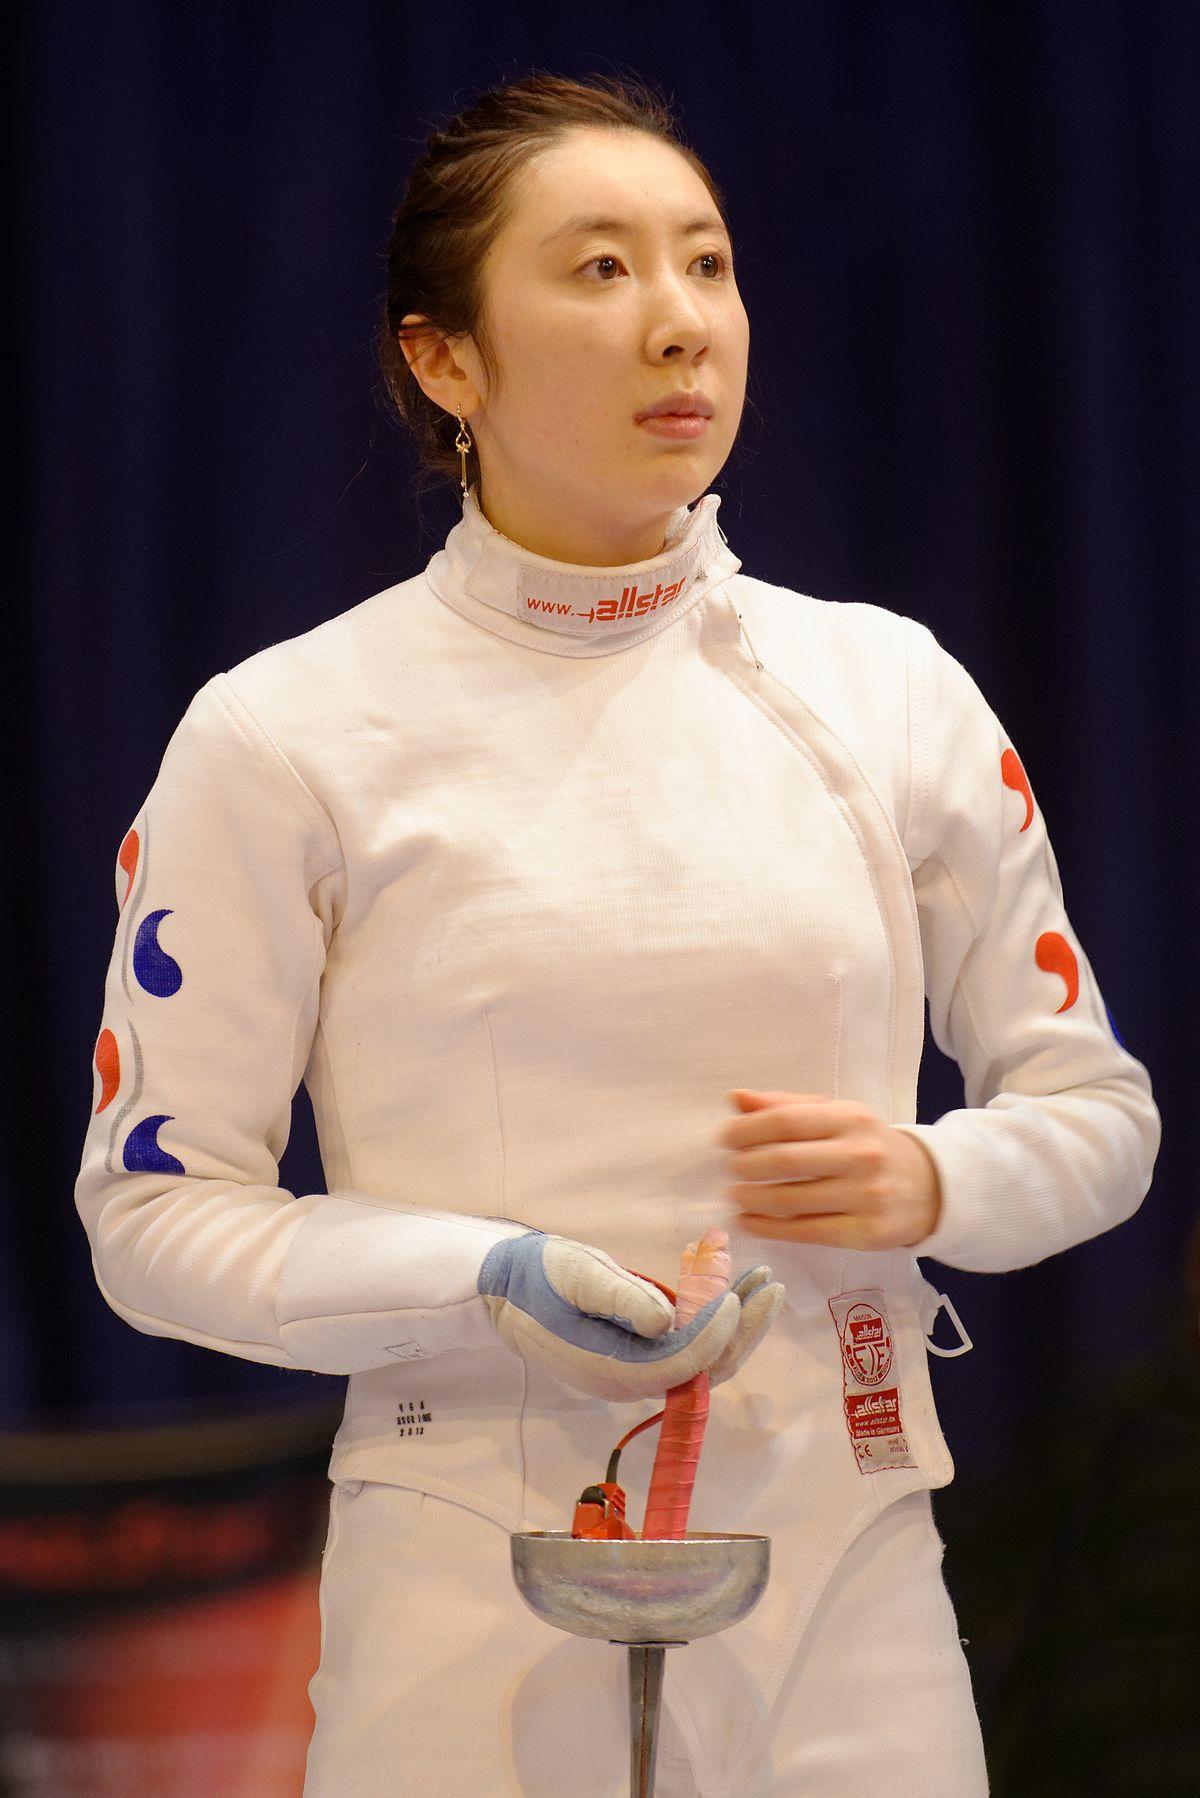 Shin A-lam - Wikipedia